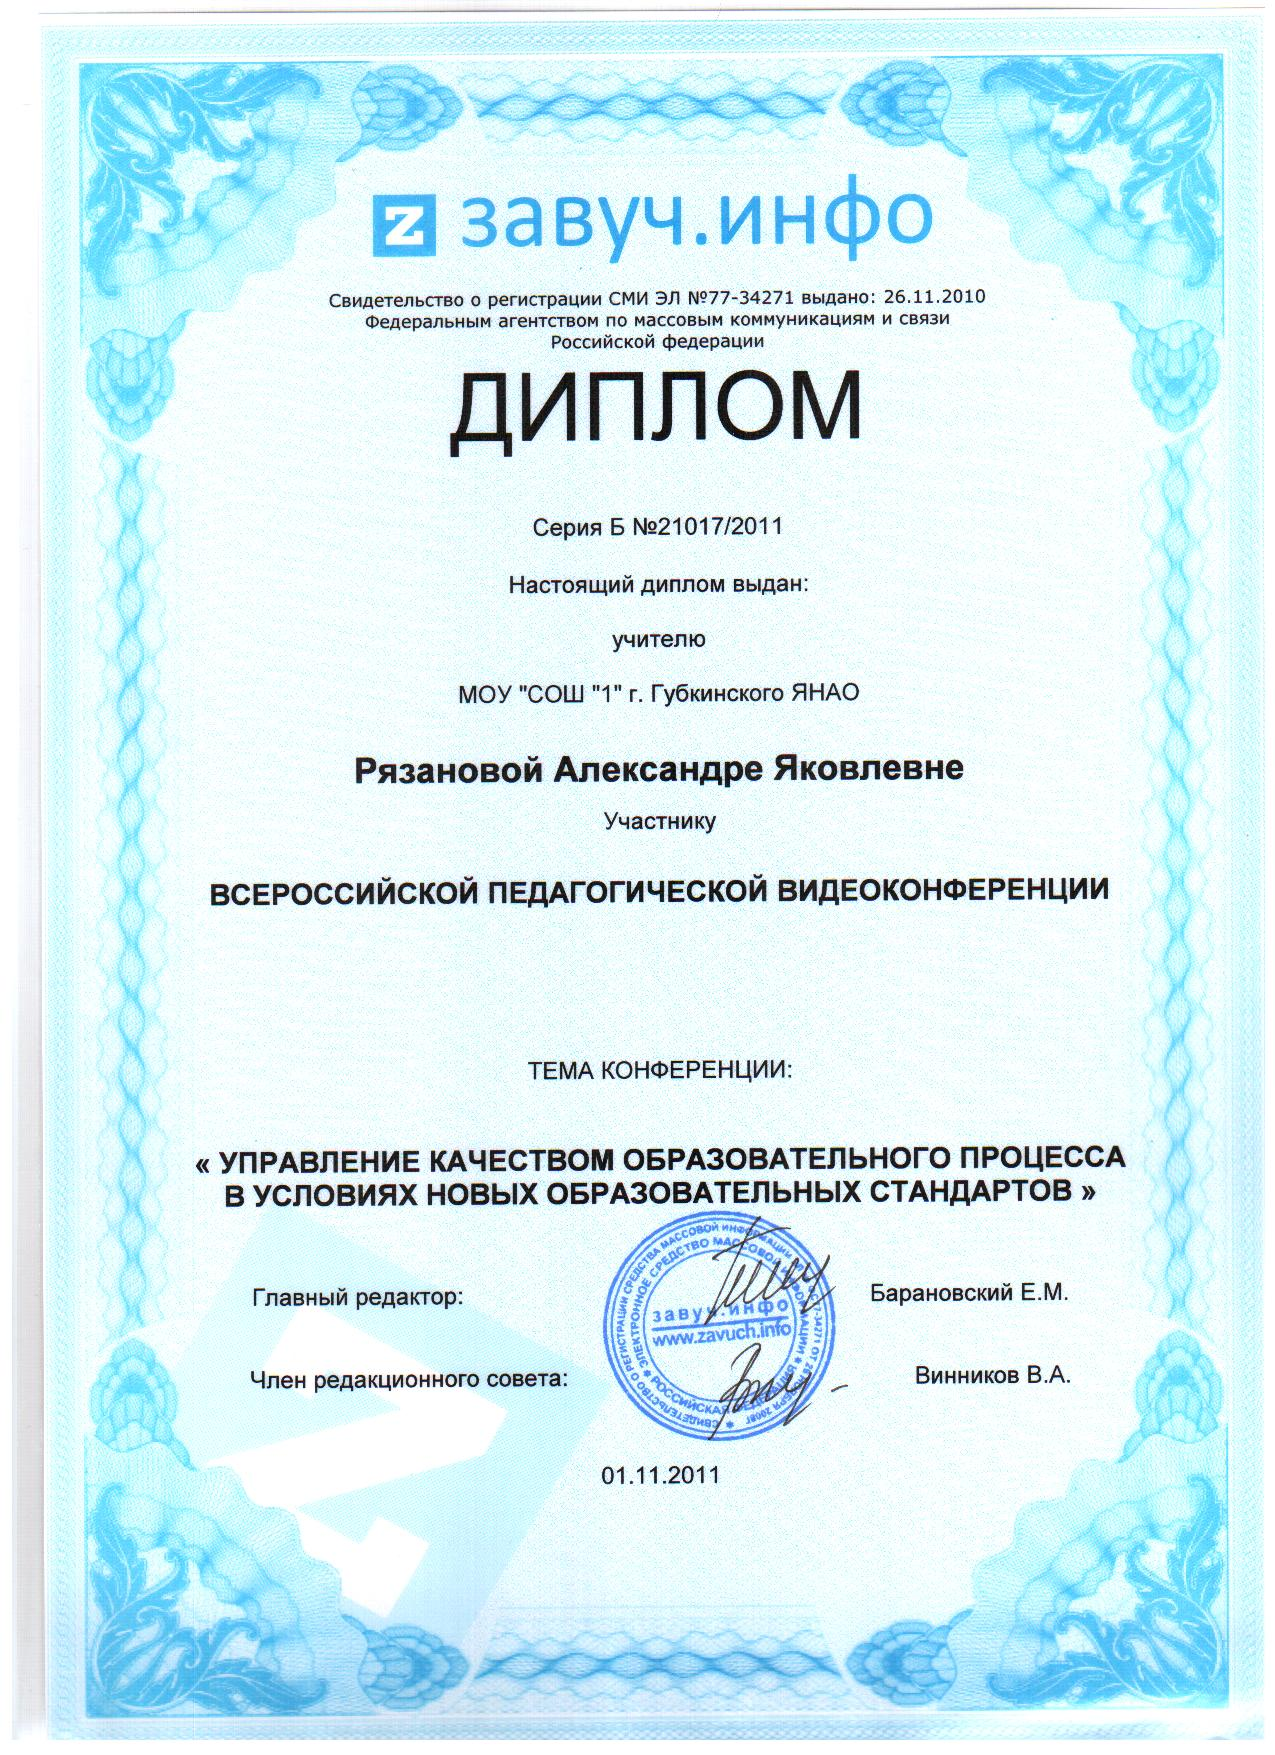 C:\Documents and Settings\Admin\Рабочий стол\грамоты\27.jpg